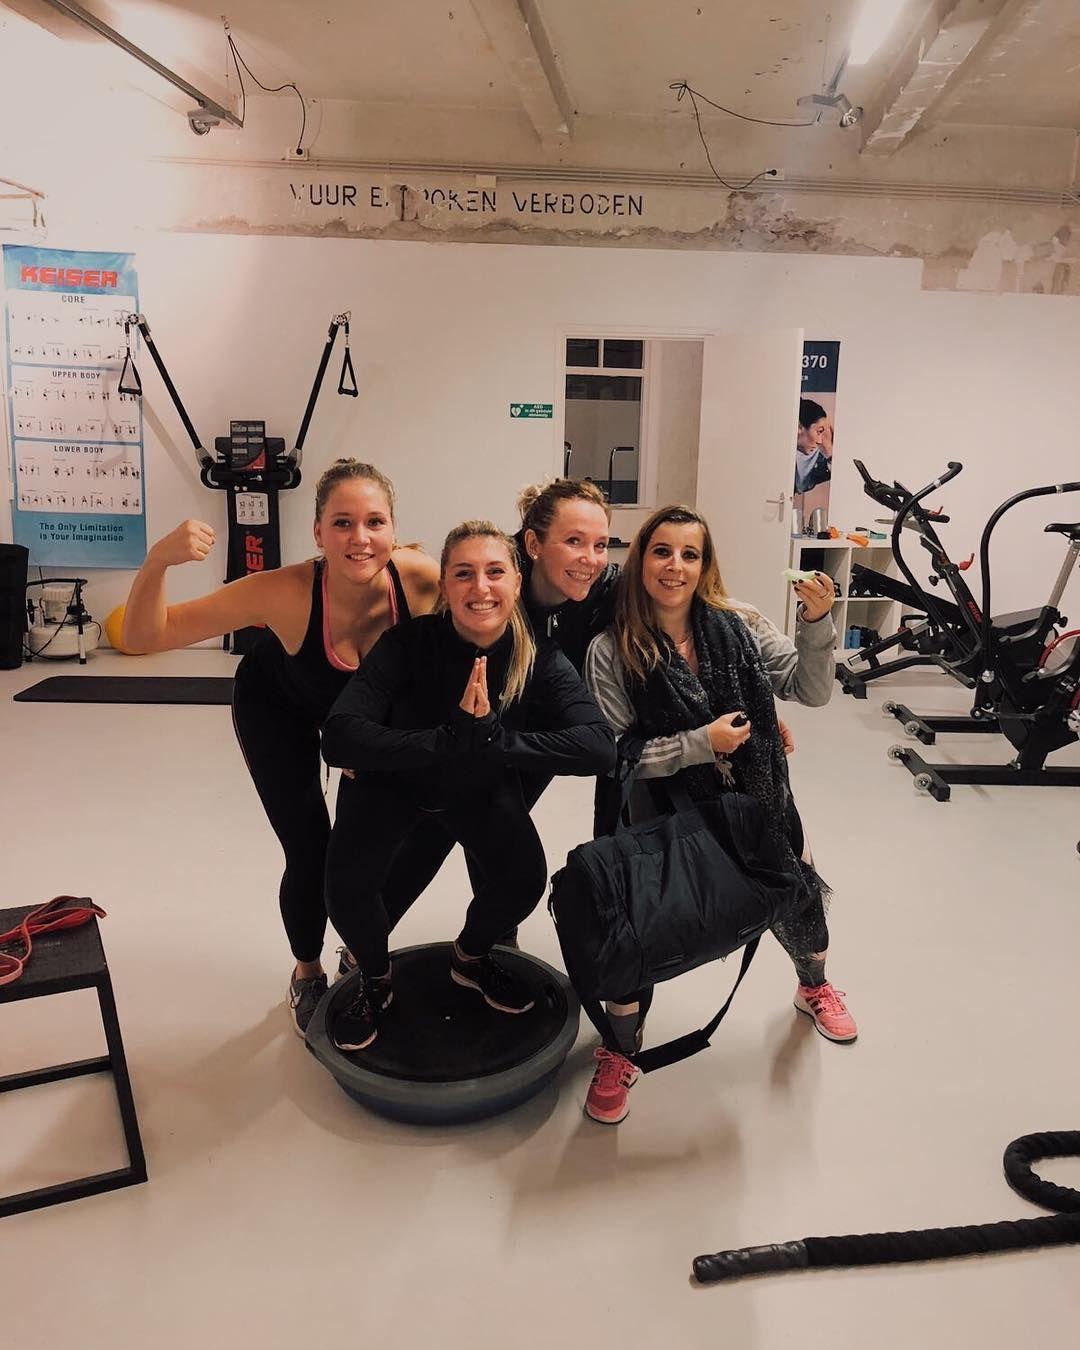 Foute Kersttrui Rotterdam.Ook Vandaag Heeft Jelle Weer Gesport Fit Team Jelle Workout